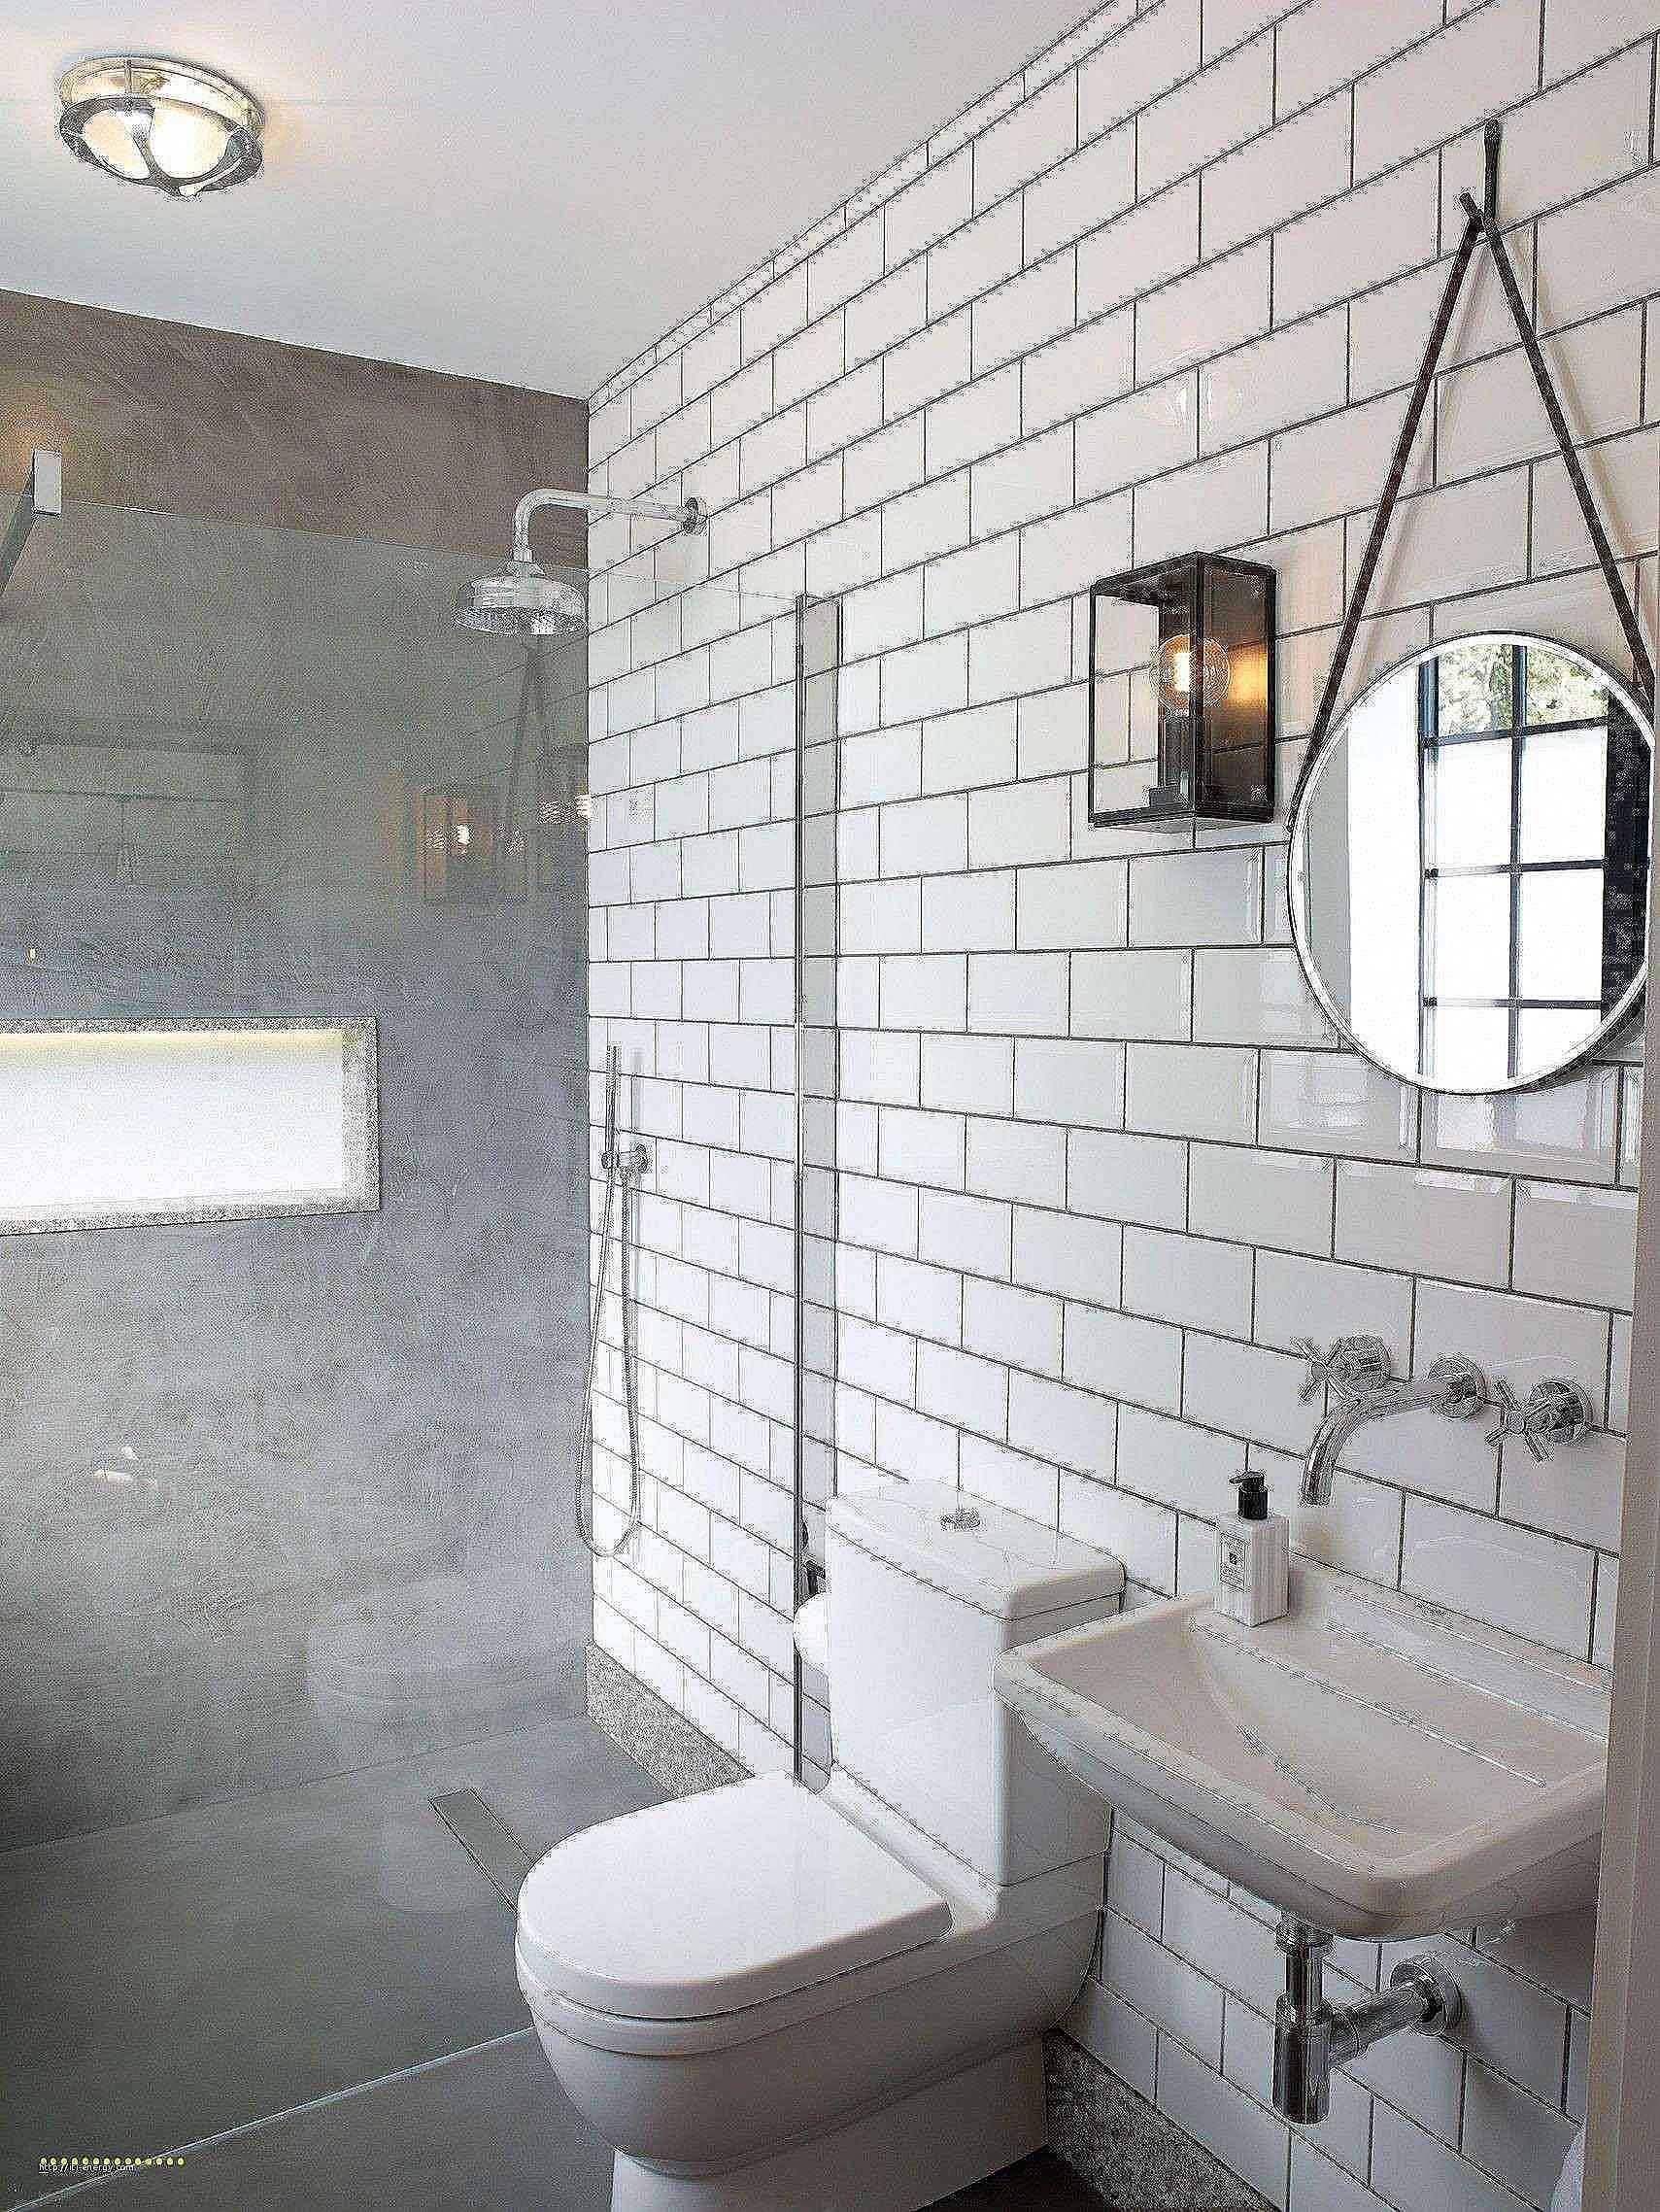 Fresh Japanese Bathroom Design Small Space Japanesebathroomequipment Japanesebathroomfeatures Japanese Bathroom Tile Designs Tile Bathroom Bathroom Design